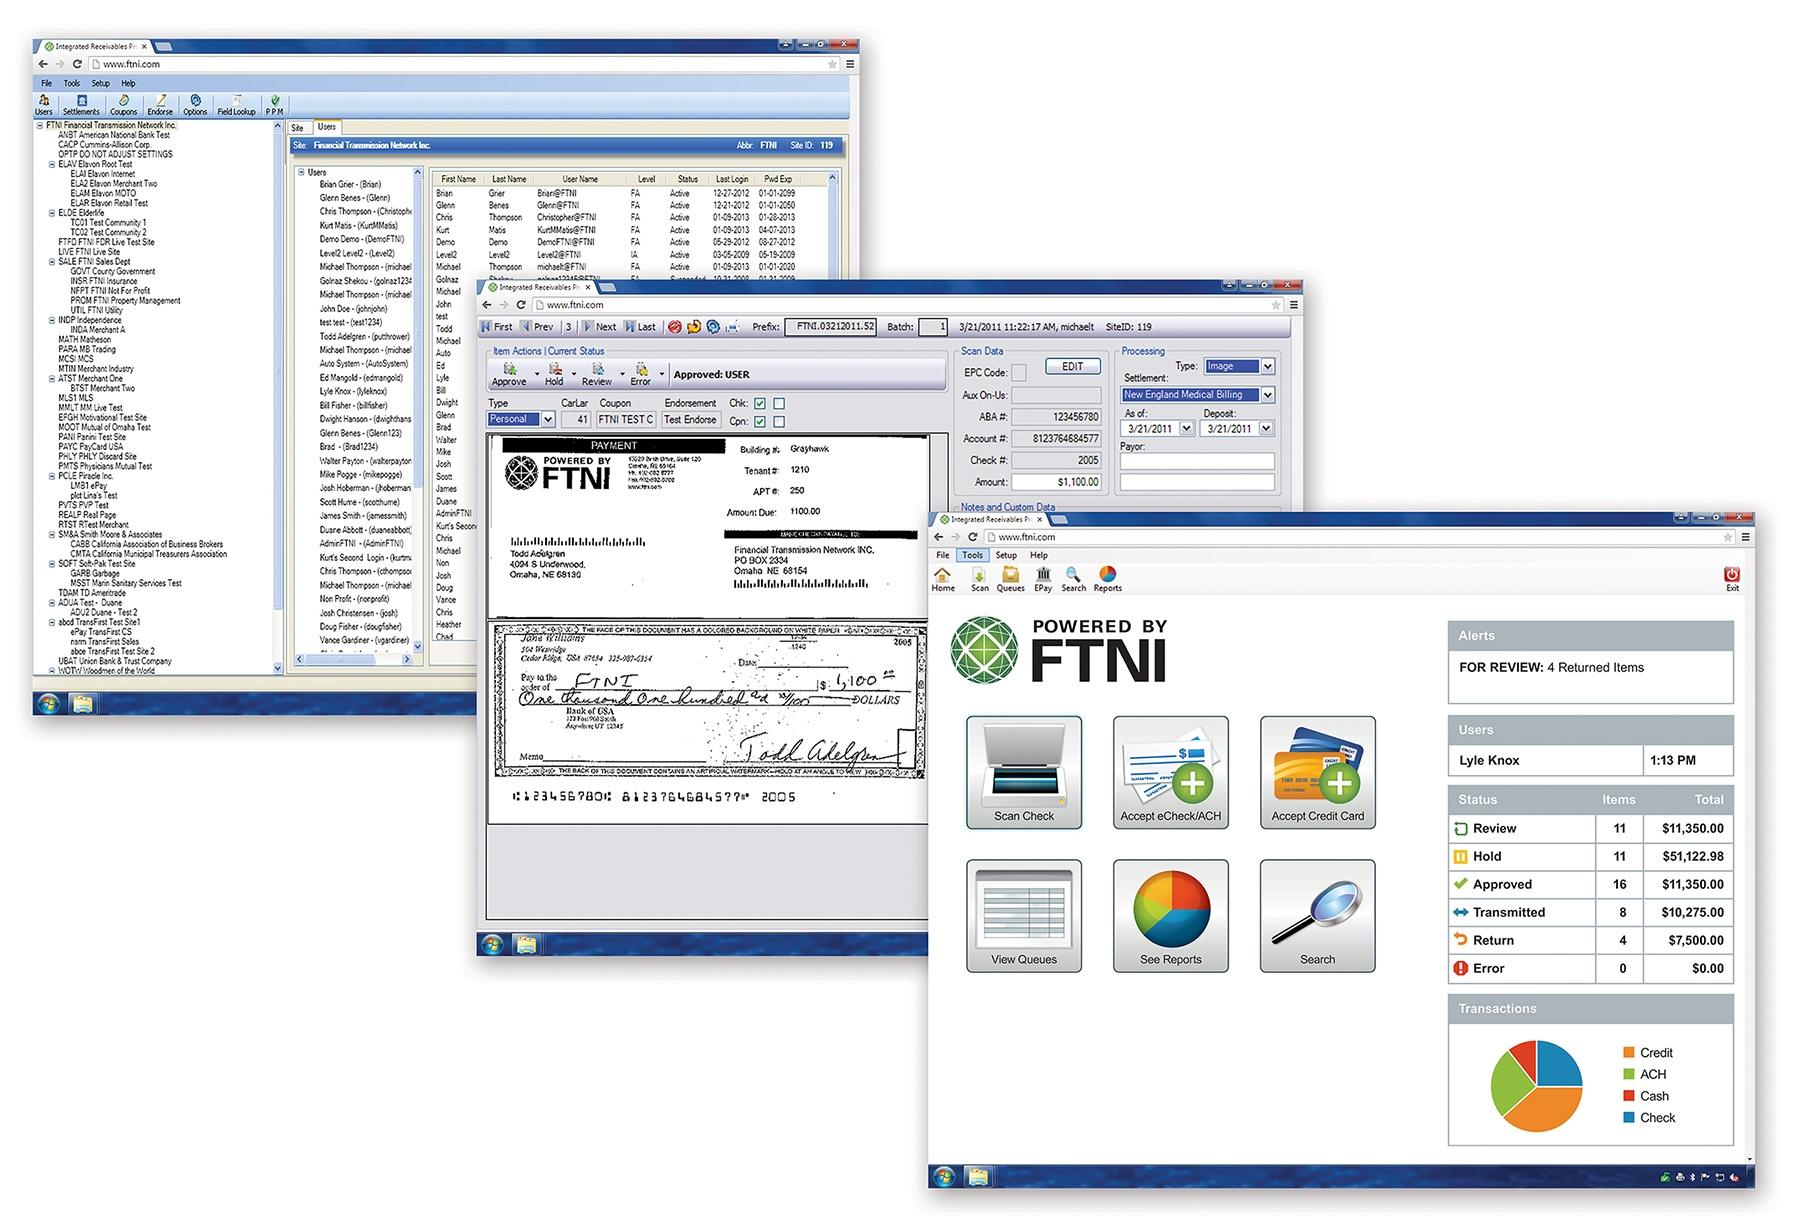 ETran Integrated Receivables Hub Interfaces | FTNI